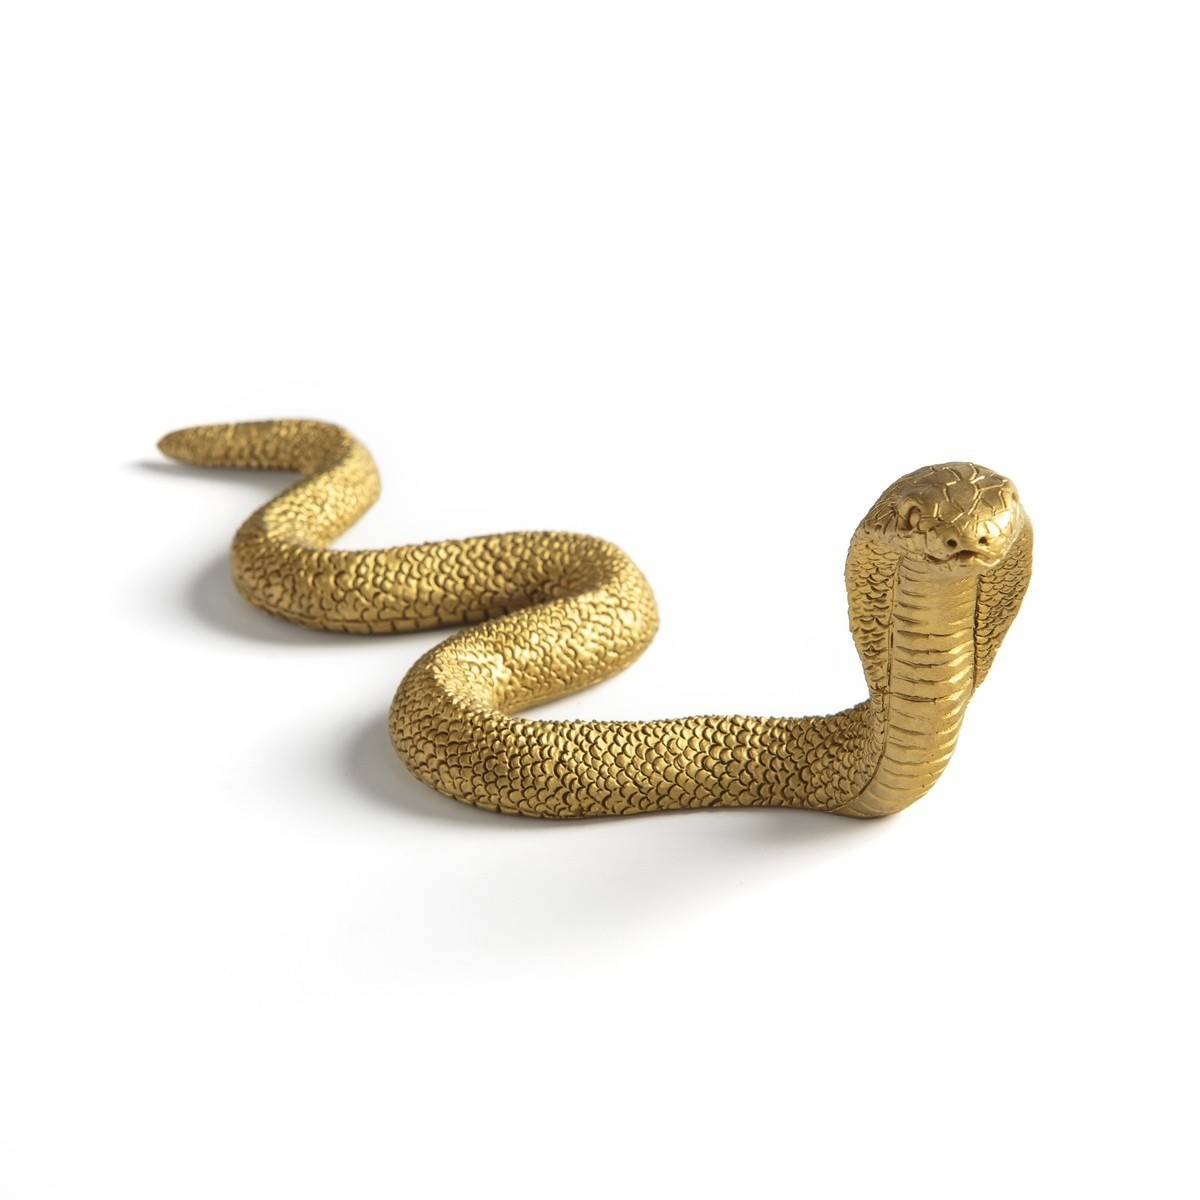 Амулет «Змея» Talisma